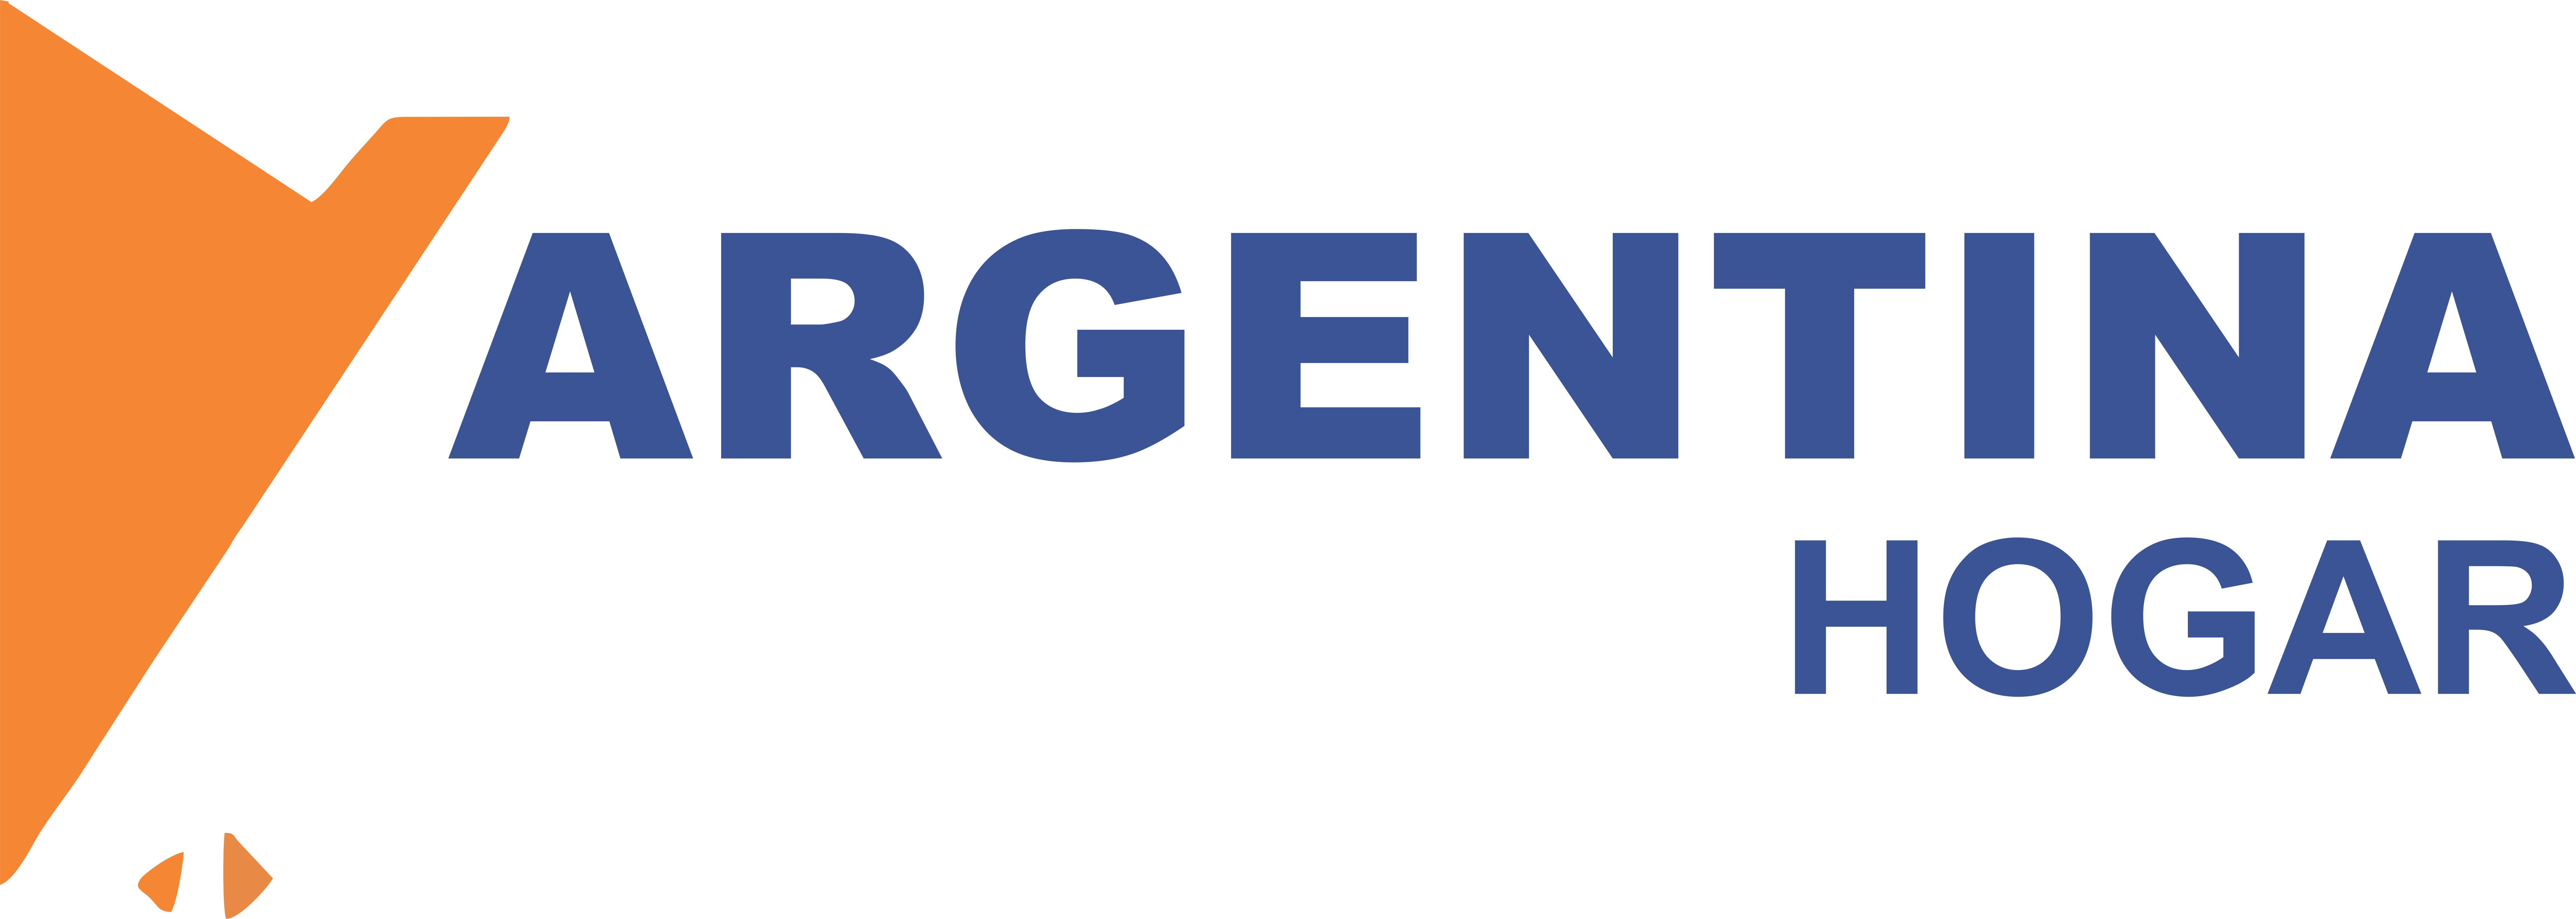 Argentina Hogar